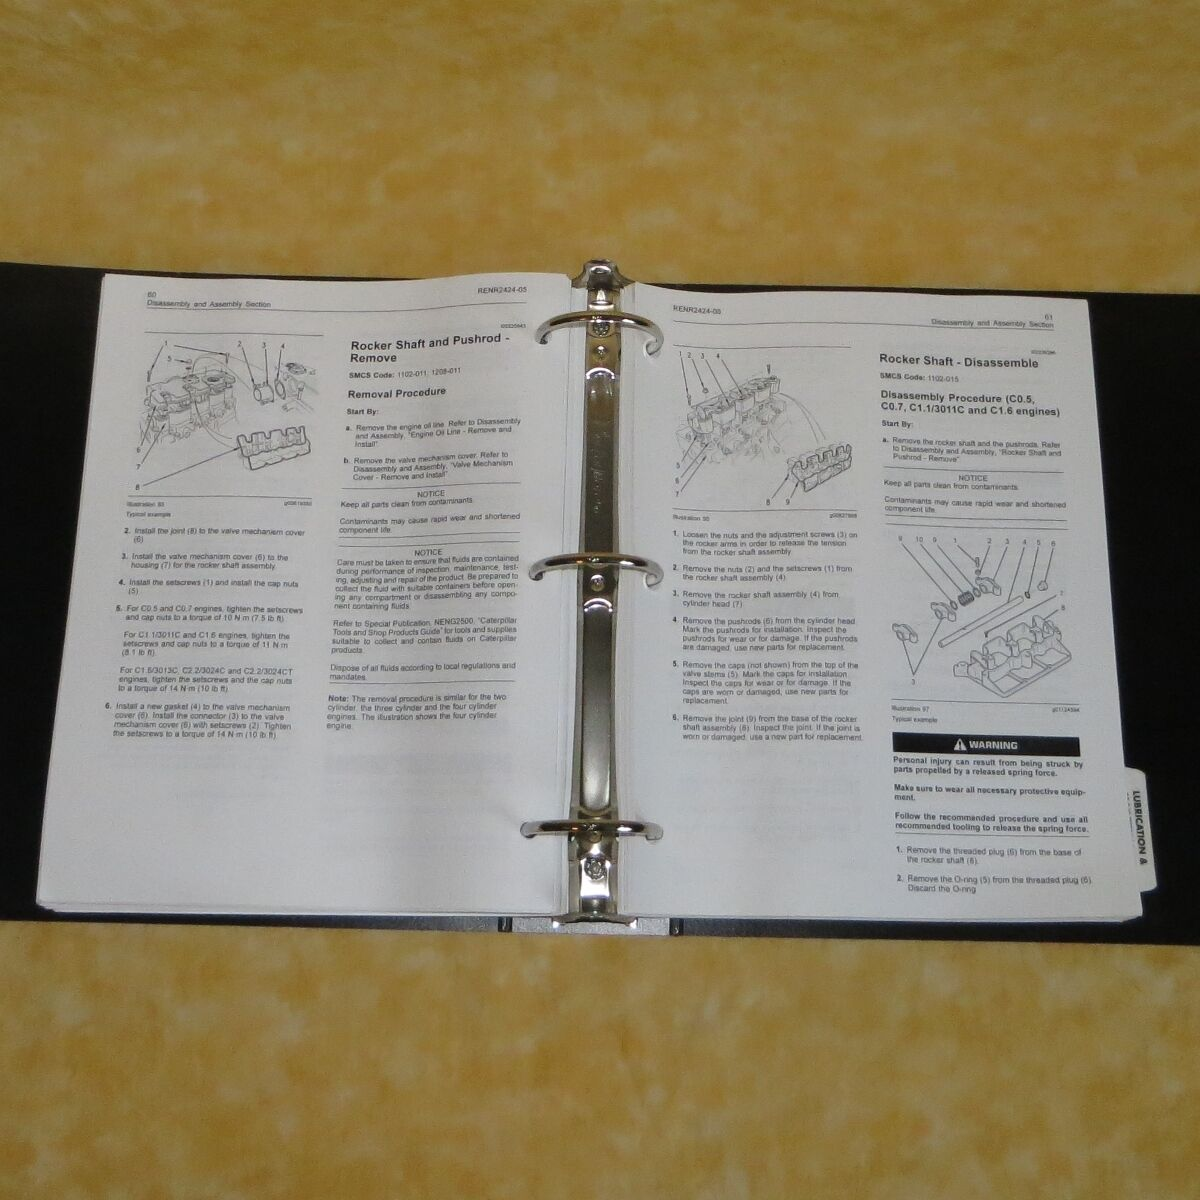 RENR2420 OEM CAT 3011c 3013c 3024c Engine Factory Service Repair Shop Manual